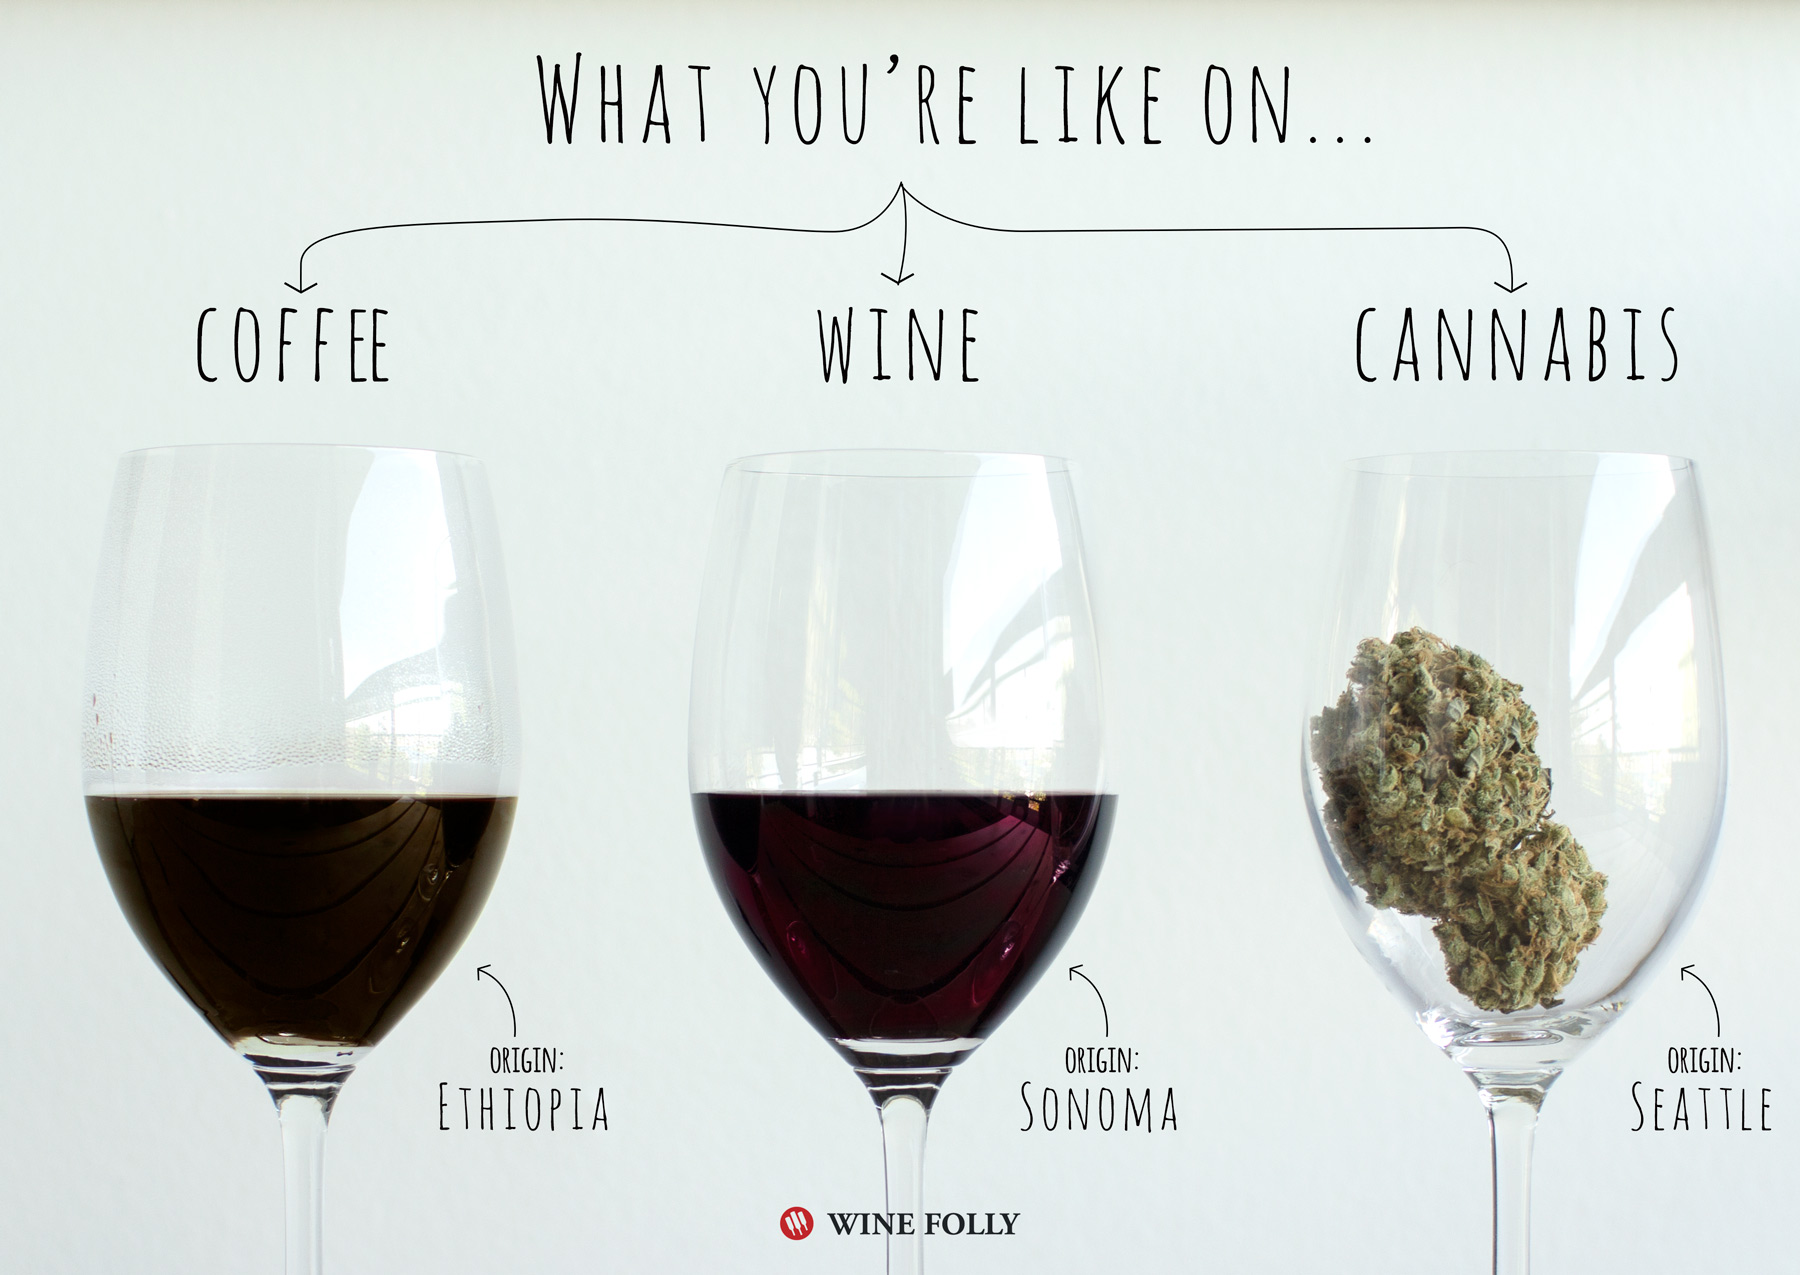 Coffee vs Wine vs Cannabis